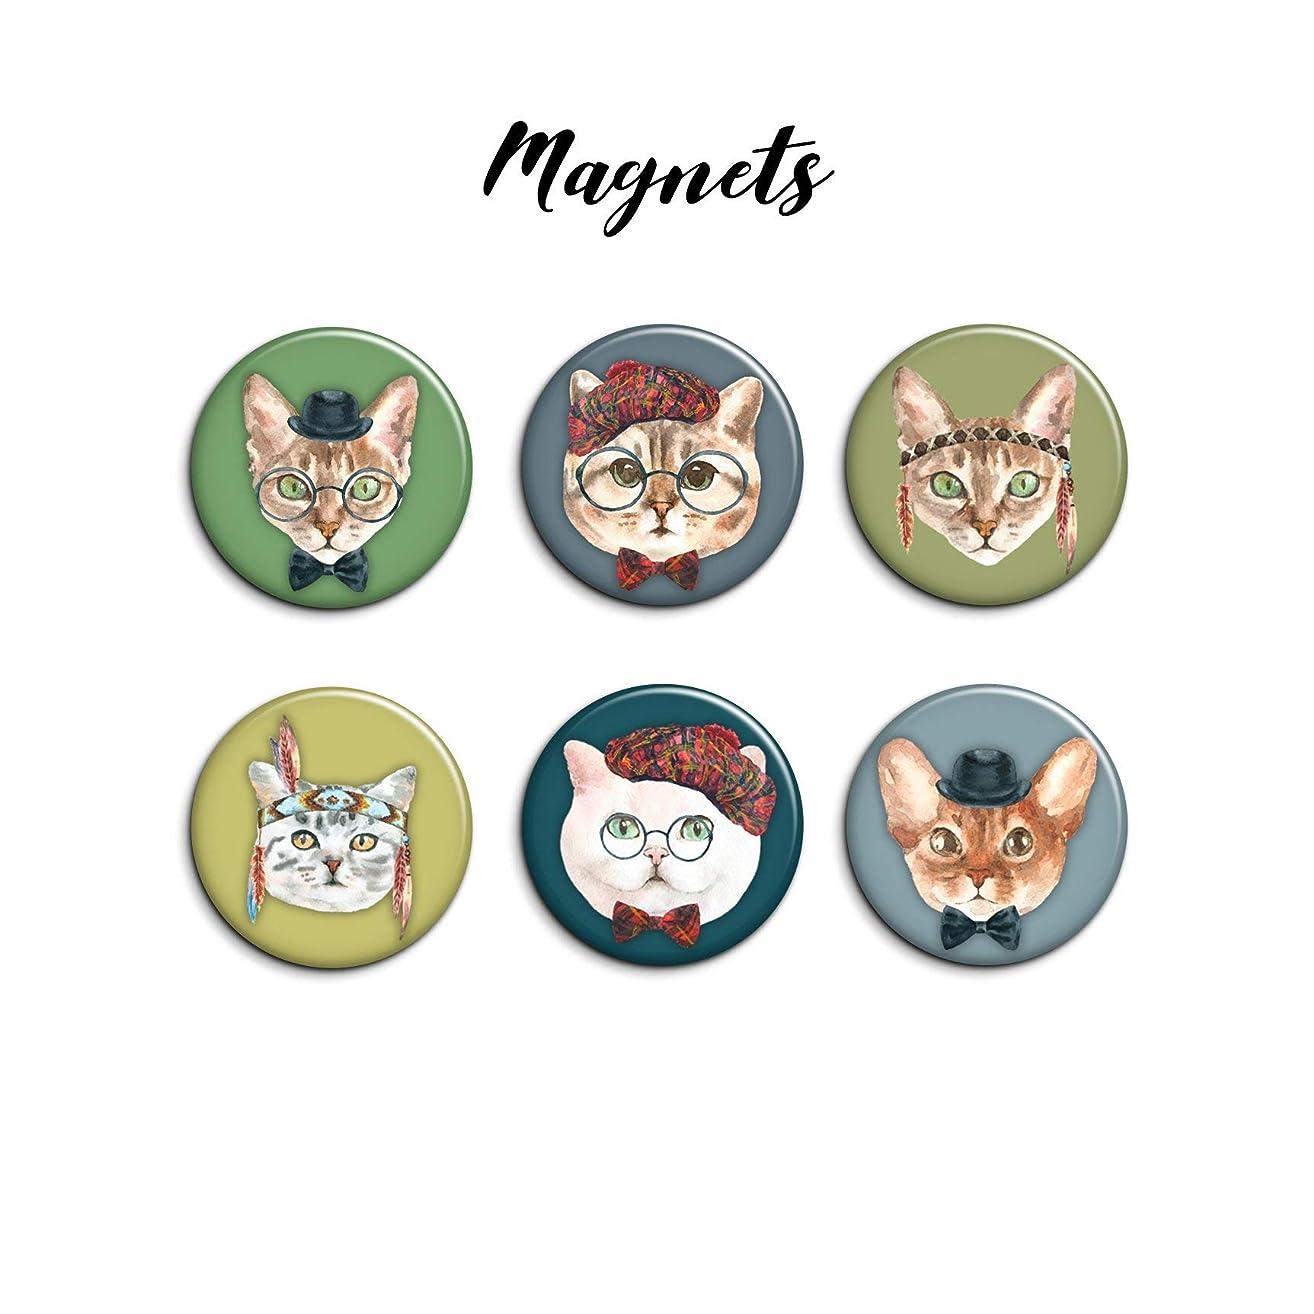 Tiffany McCoy Arts Cats in Hats 1.25 inch 6pcs Magnet set